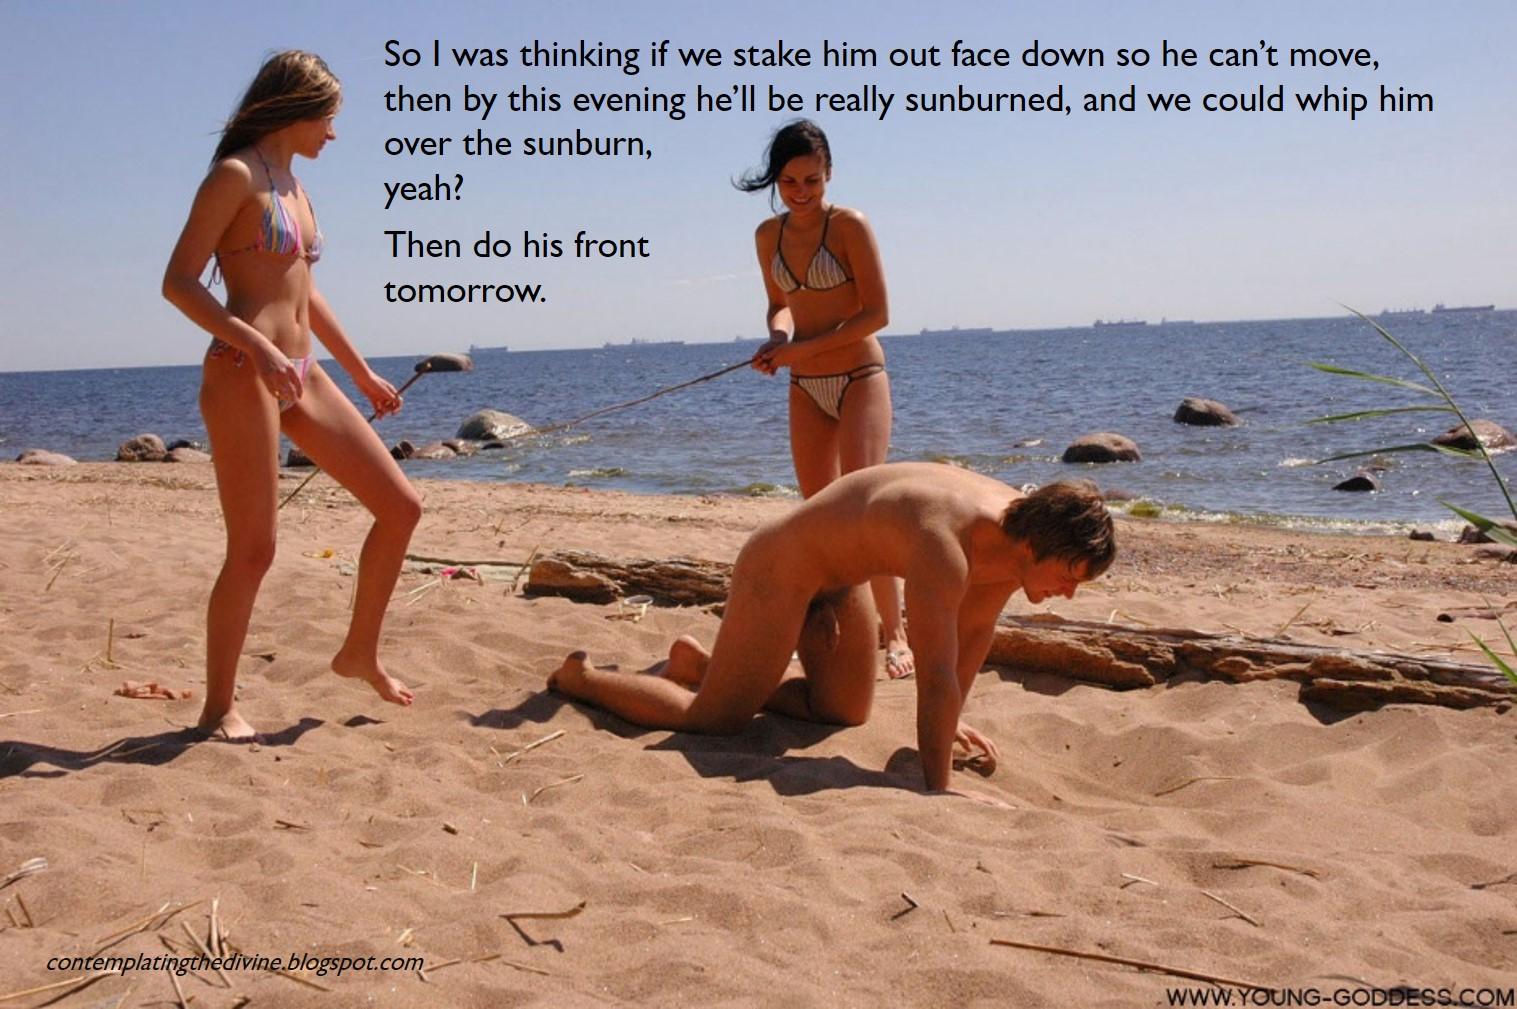 from Princeton nude burning man having sex